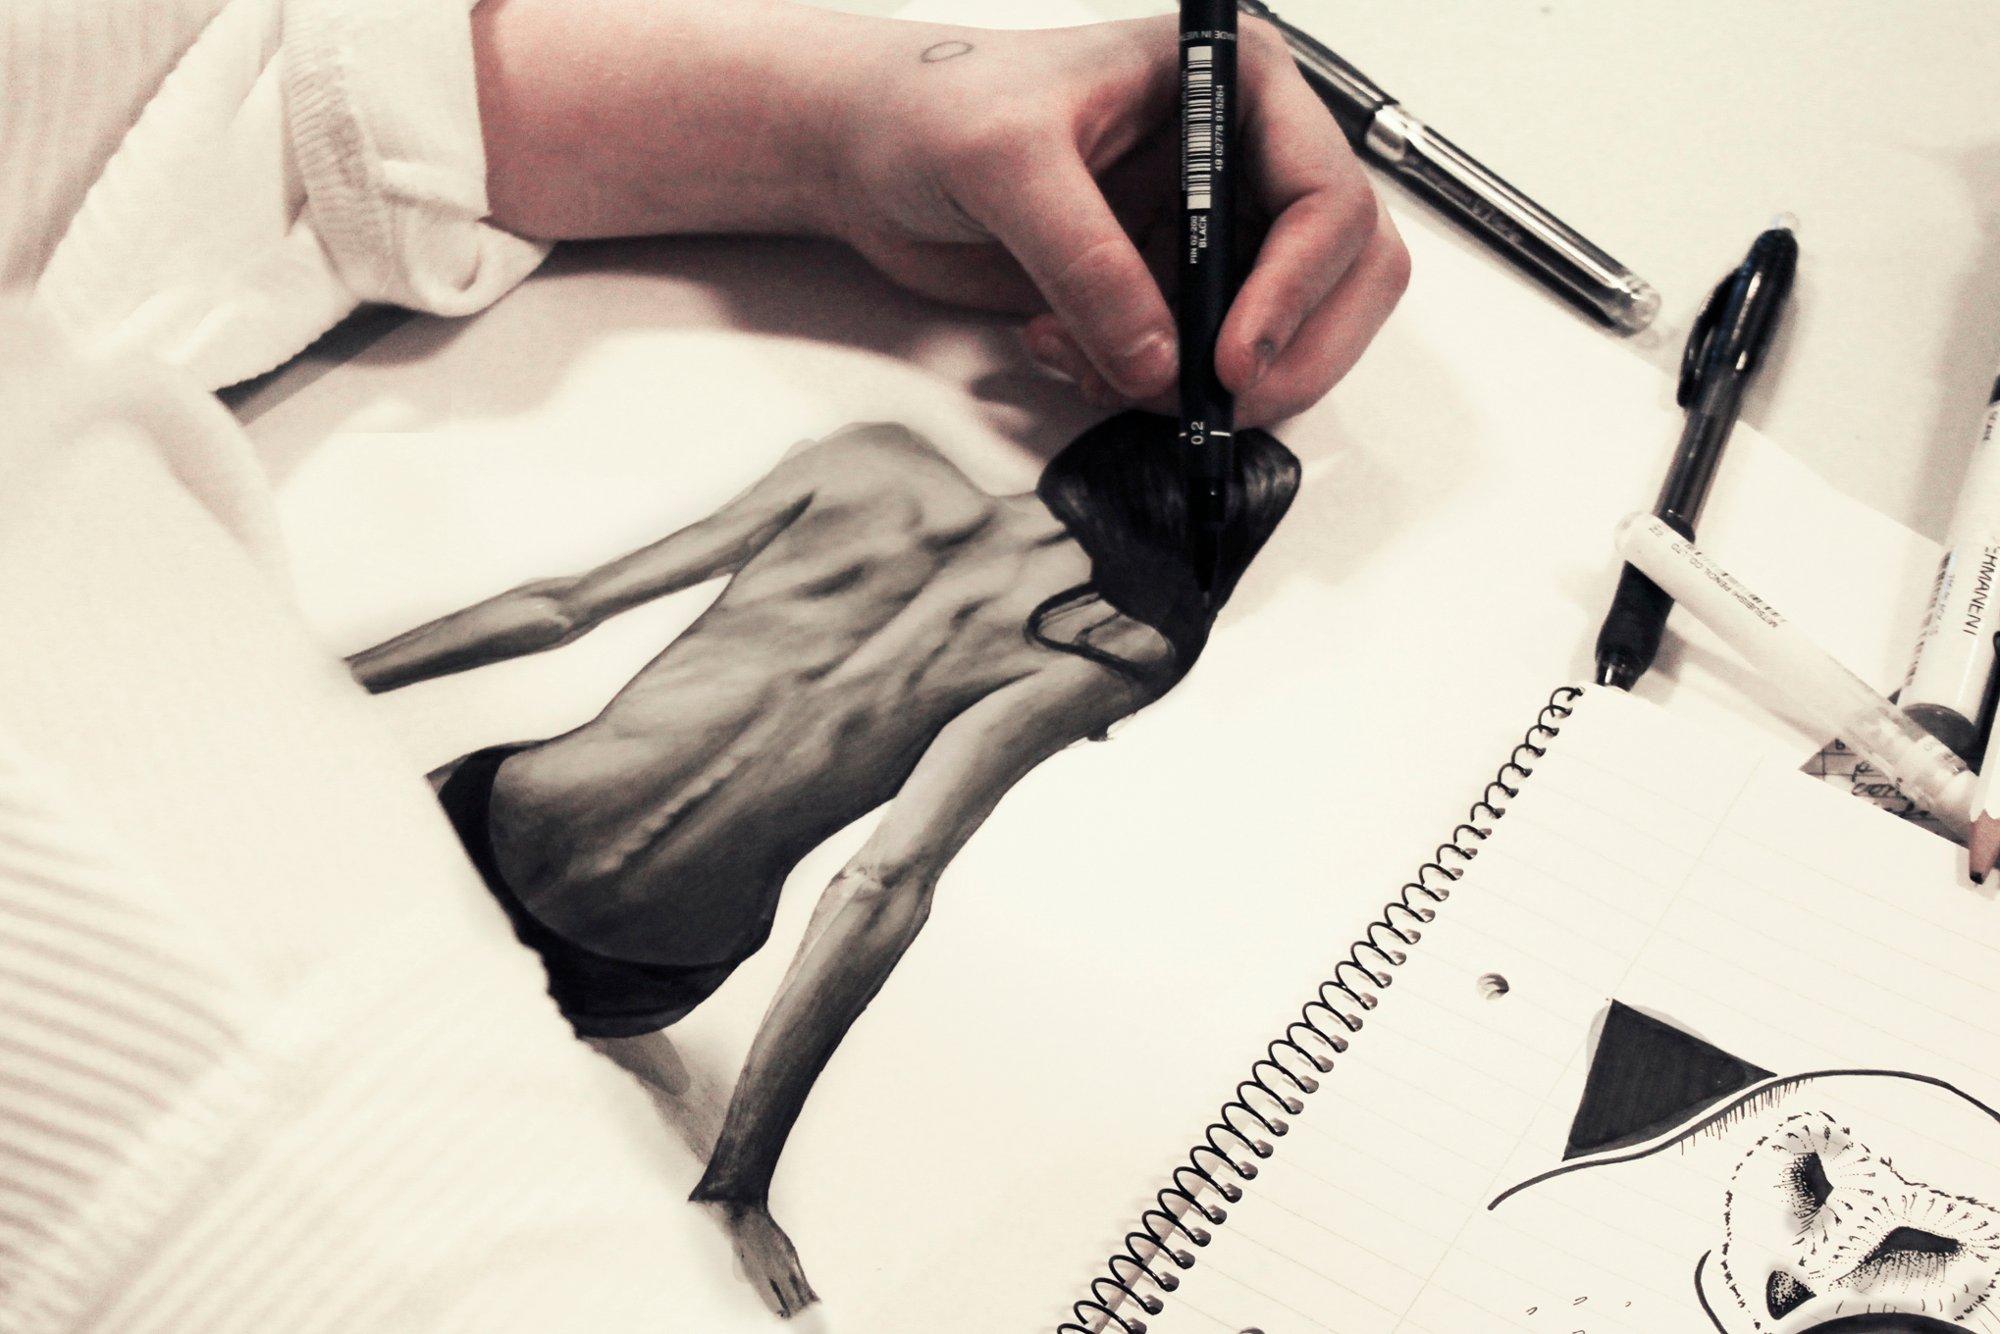 Tegne kan ting man 10 kreative